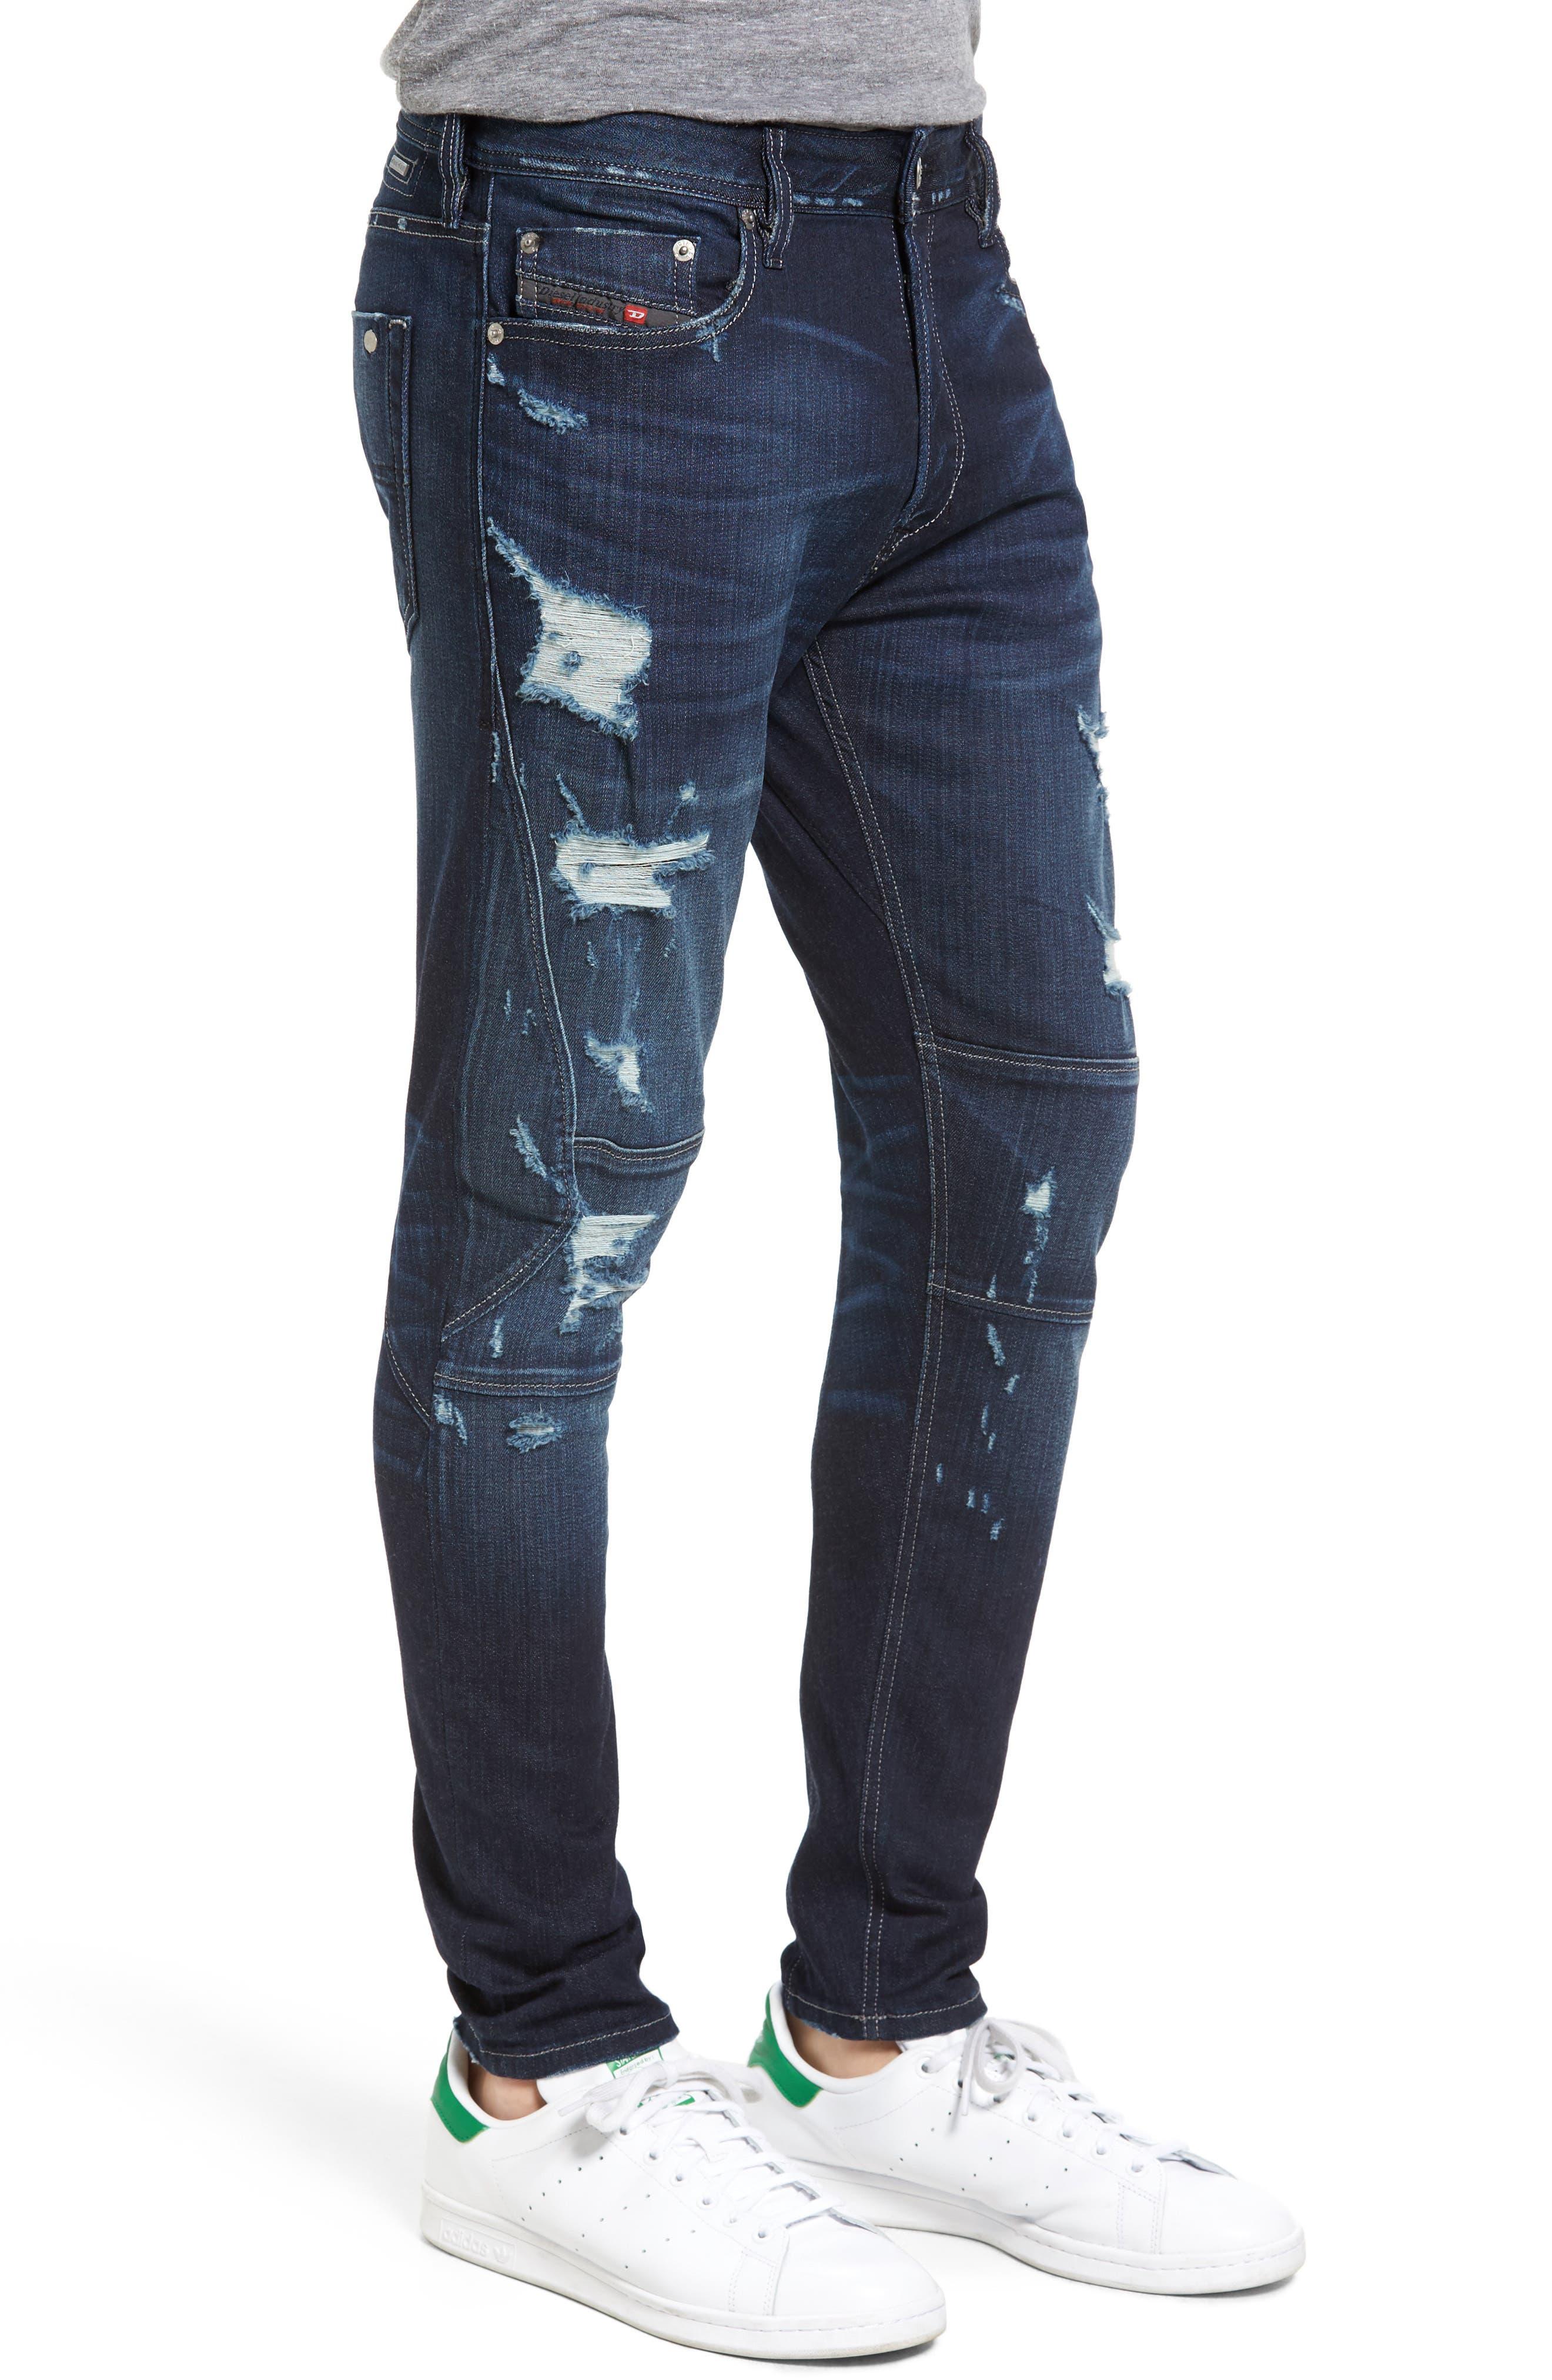 T-Ride Skinny Fit Moto Jeans,                             Alternate thumbnail 3, color,                             400